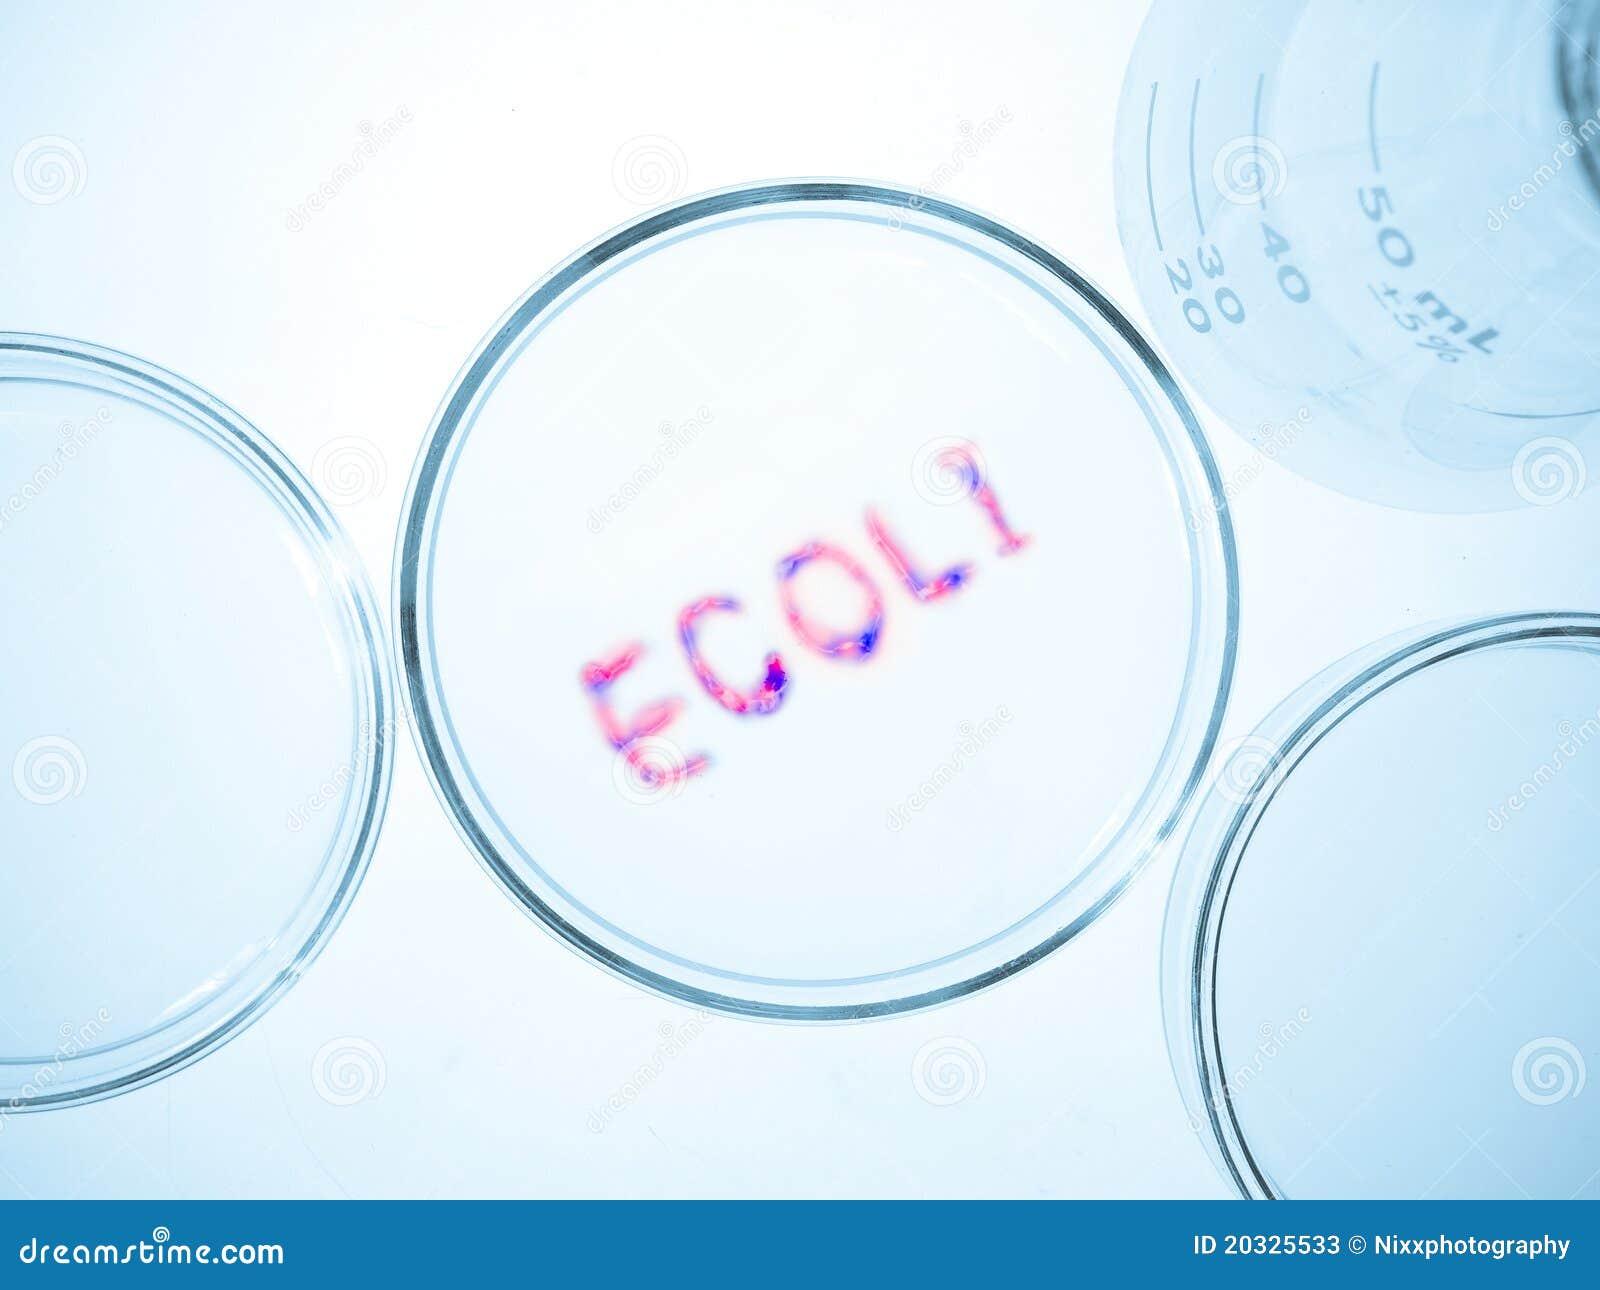 how to make glycerol ecoli stock